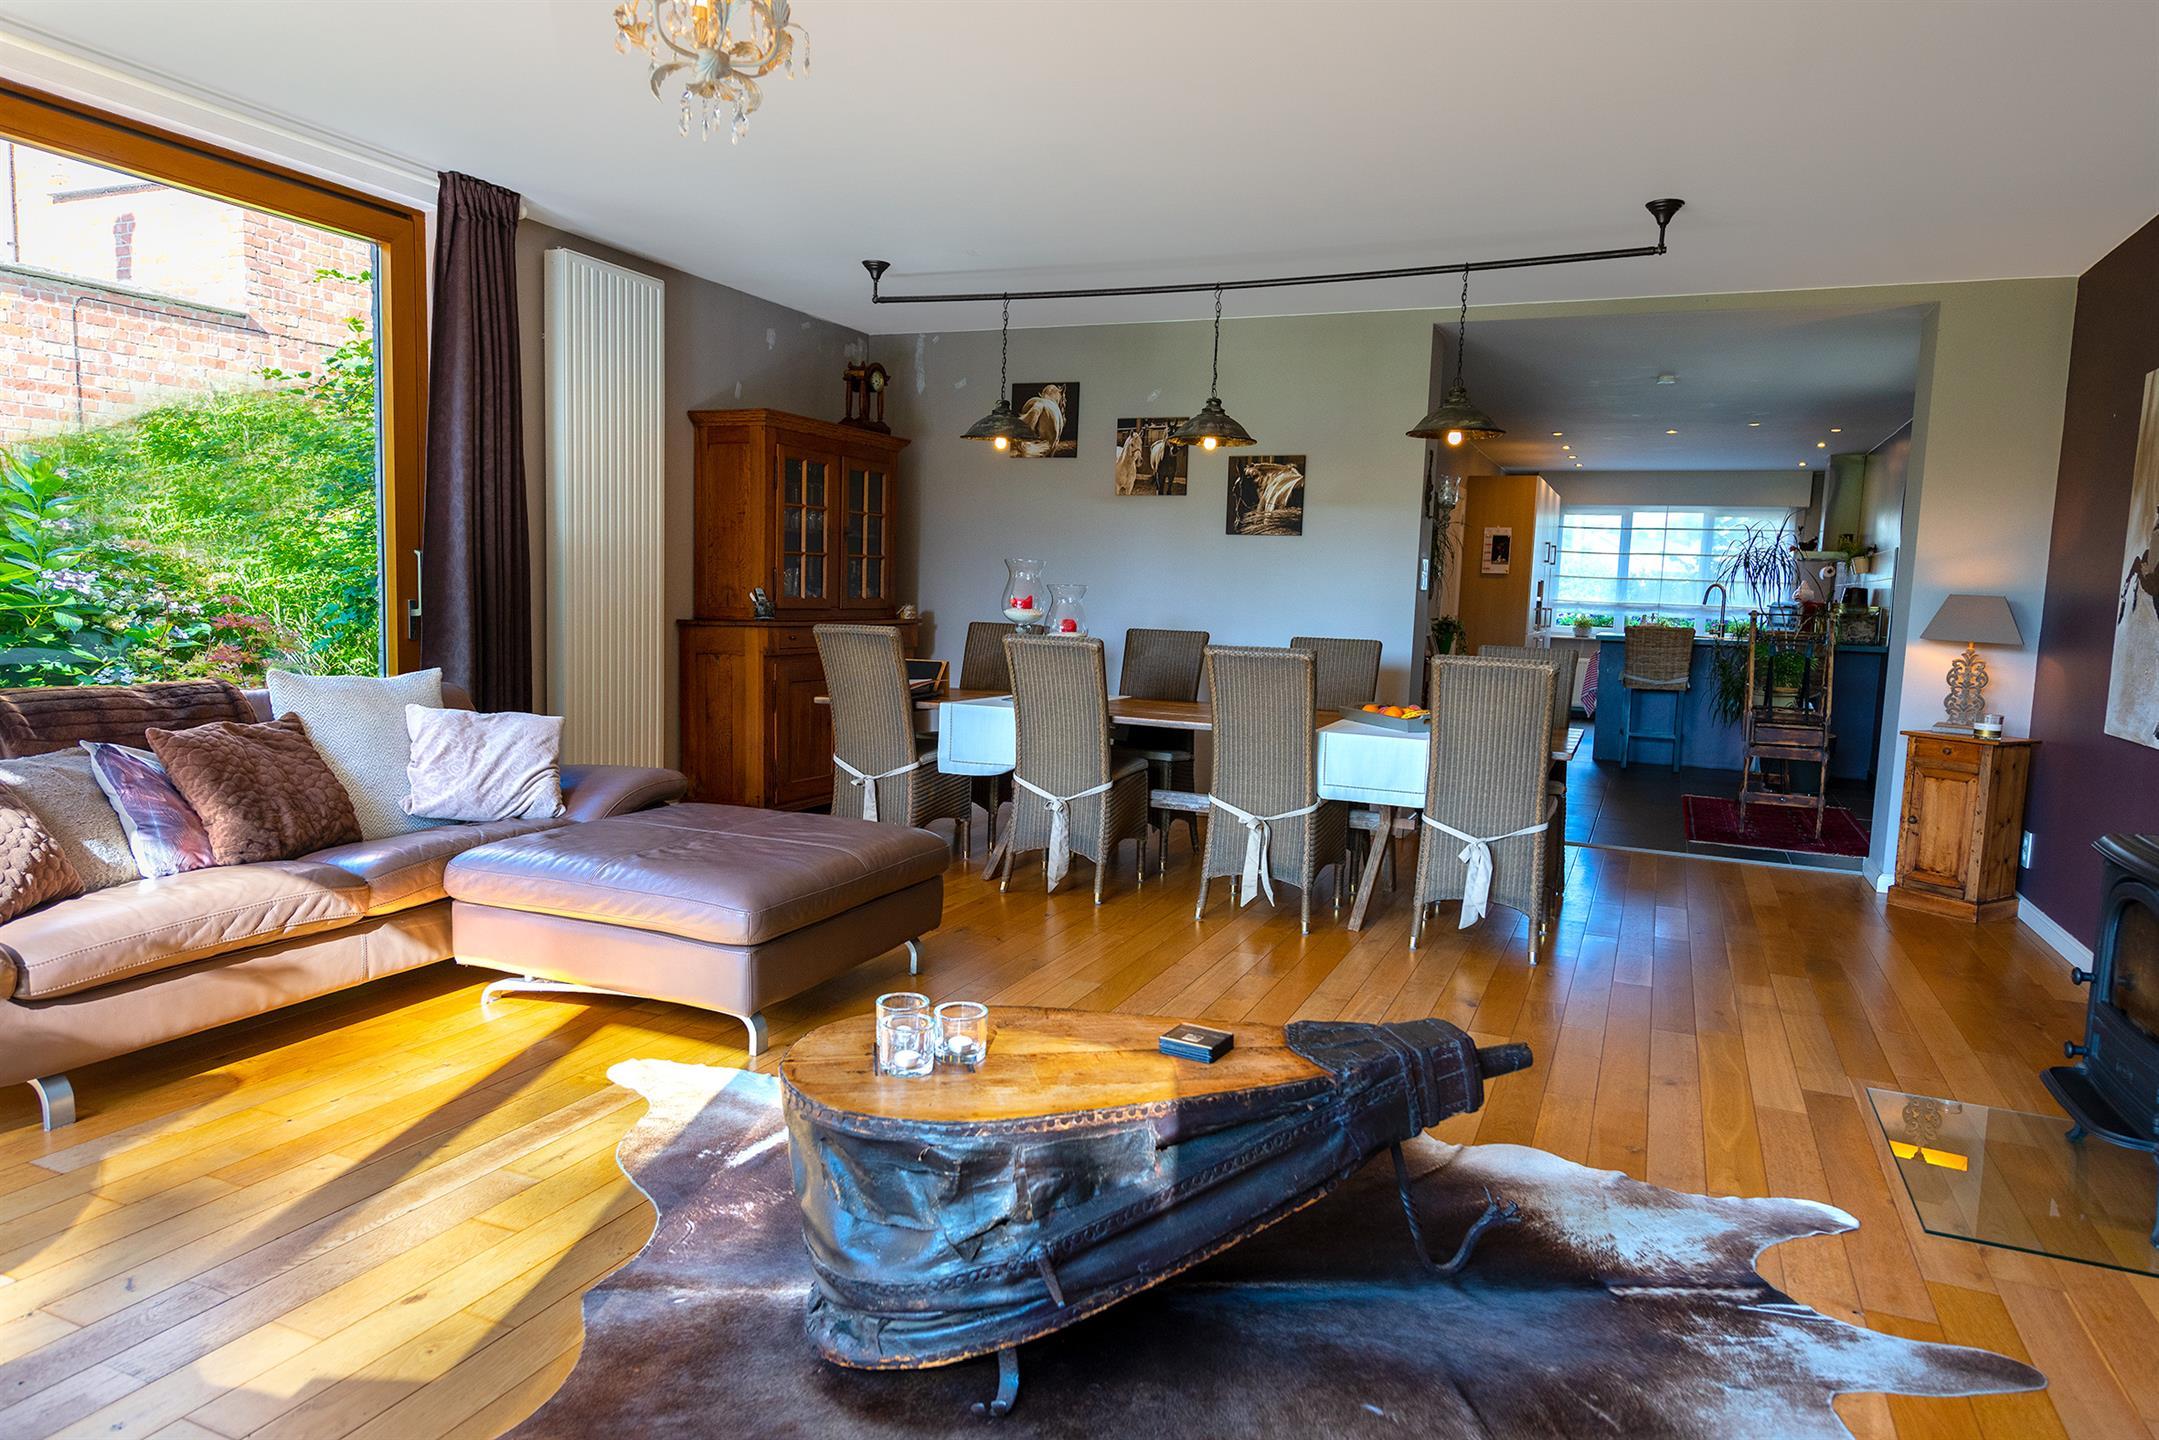 Charmant huis - Sint-Katelijne-Waver - #4492892-8